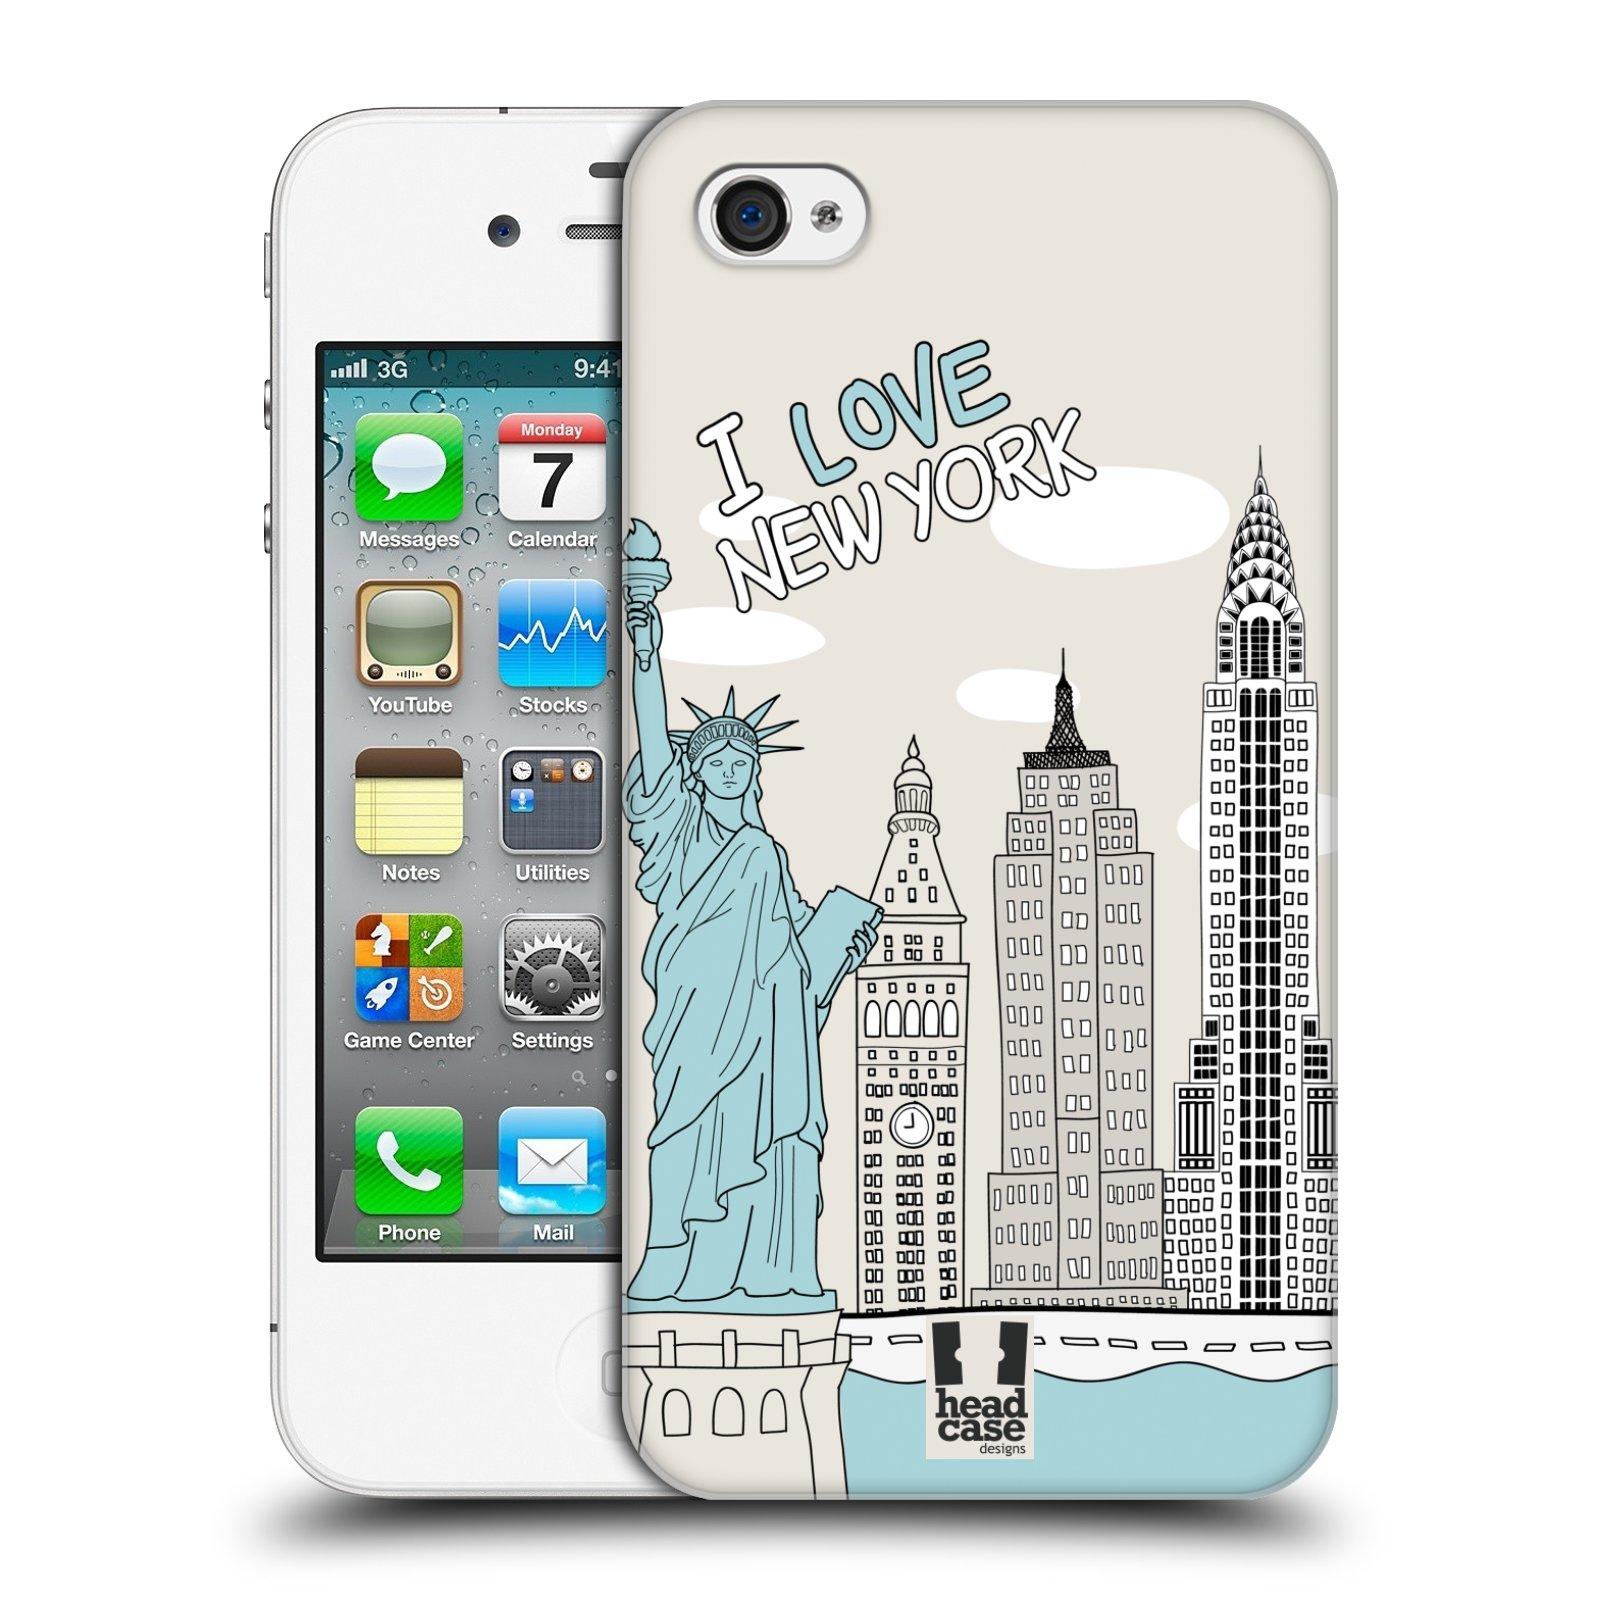 HEAD CASE plastový obal na mobil Apple Iphone 4/4S vzor Kreslená městečka MODRÁ, USA, New York, I LOVE NEW YORK